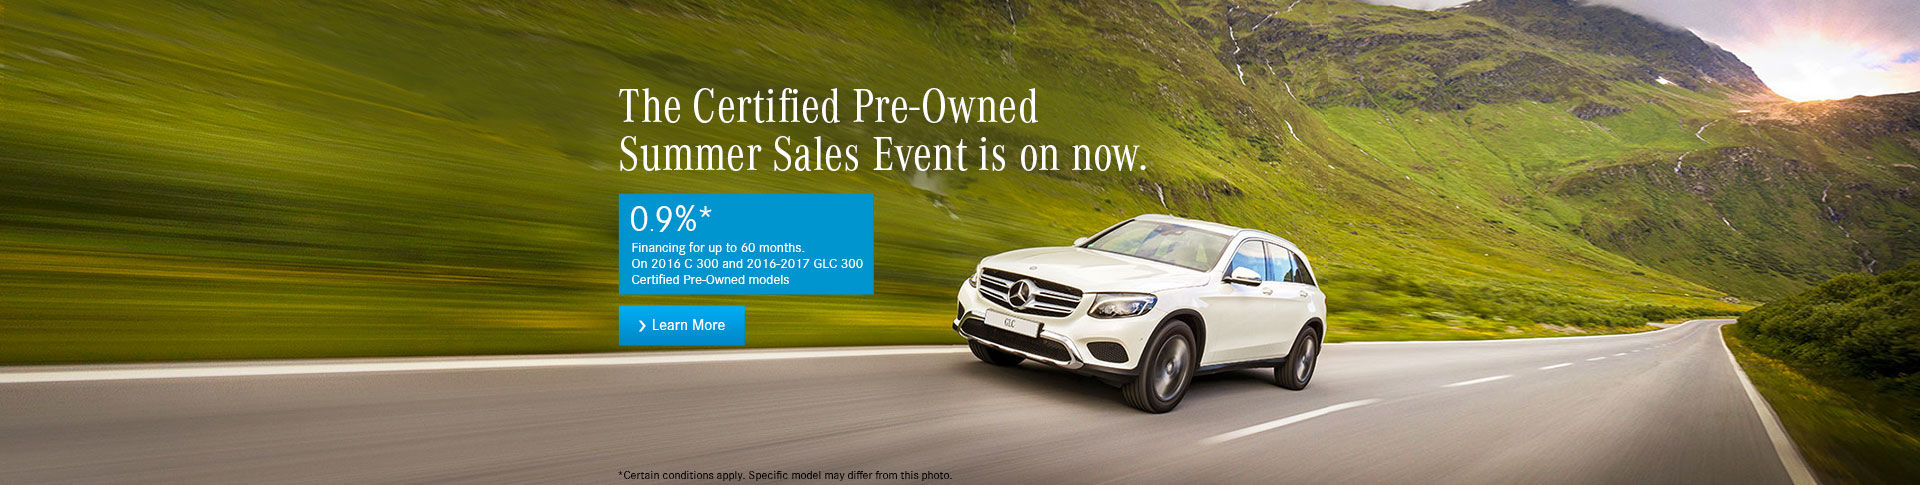 Mercedes CPO Summer Sales Event